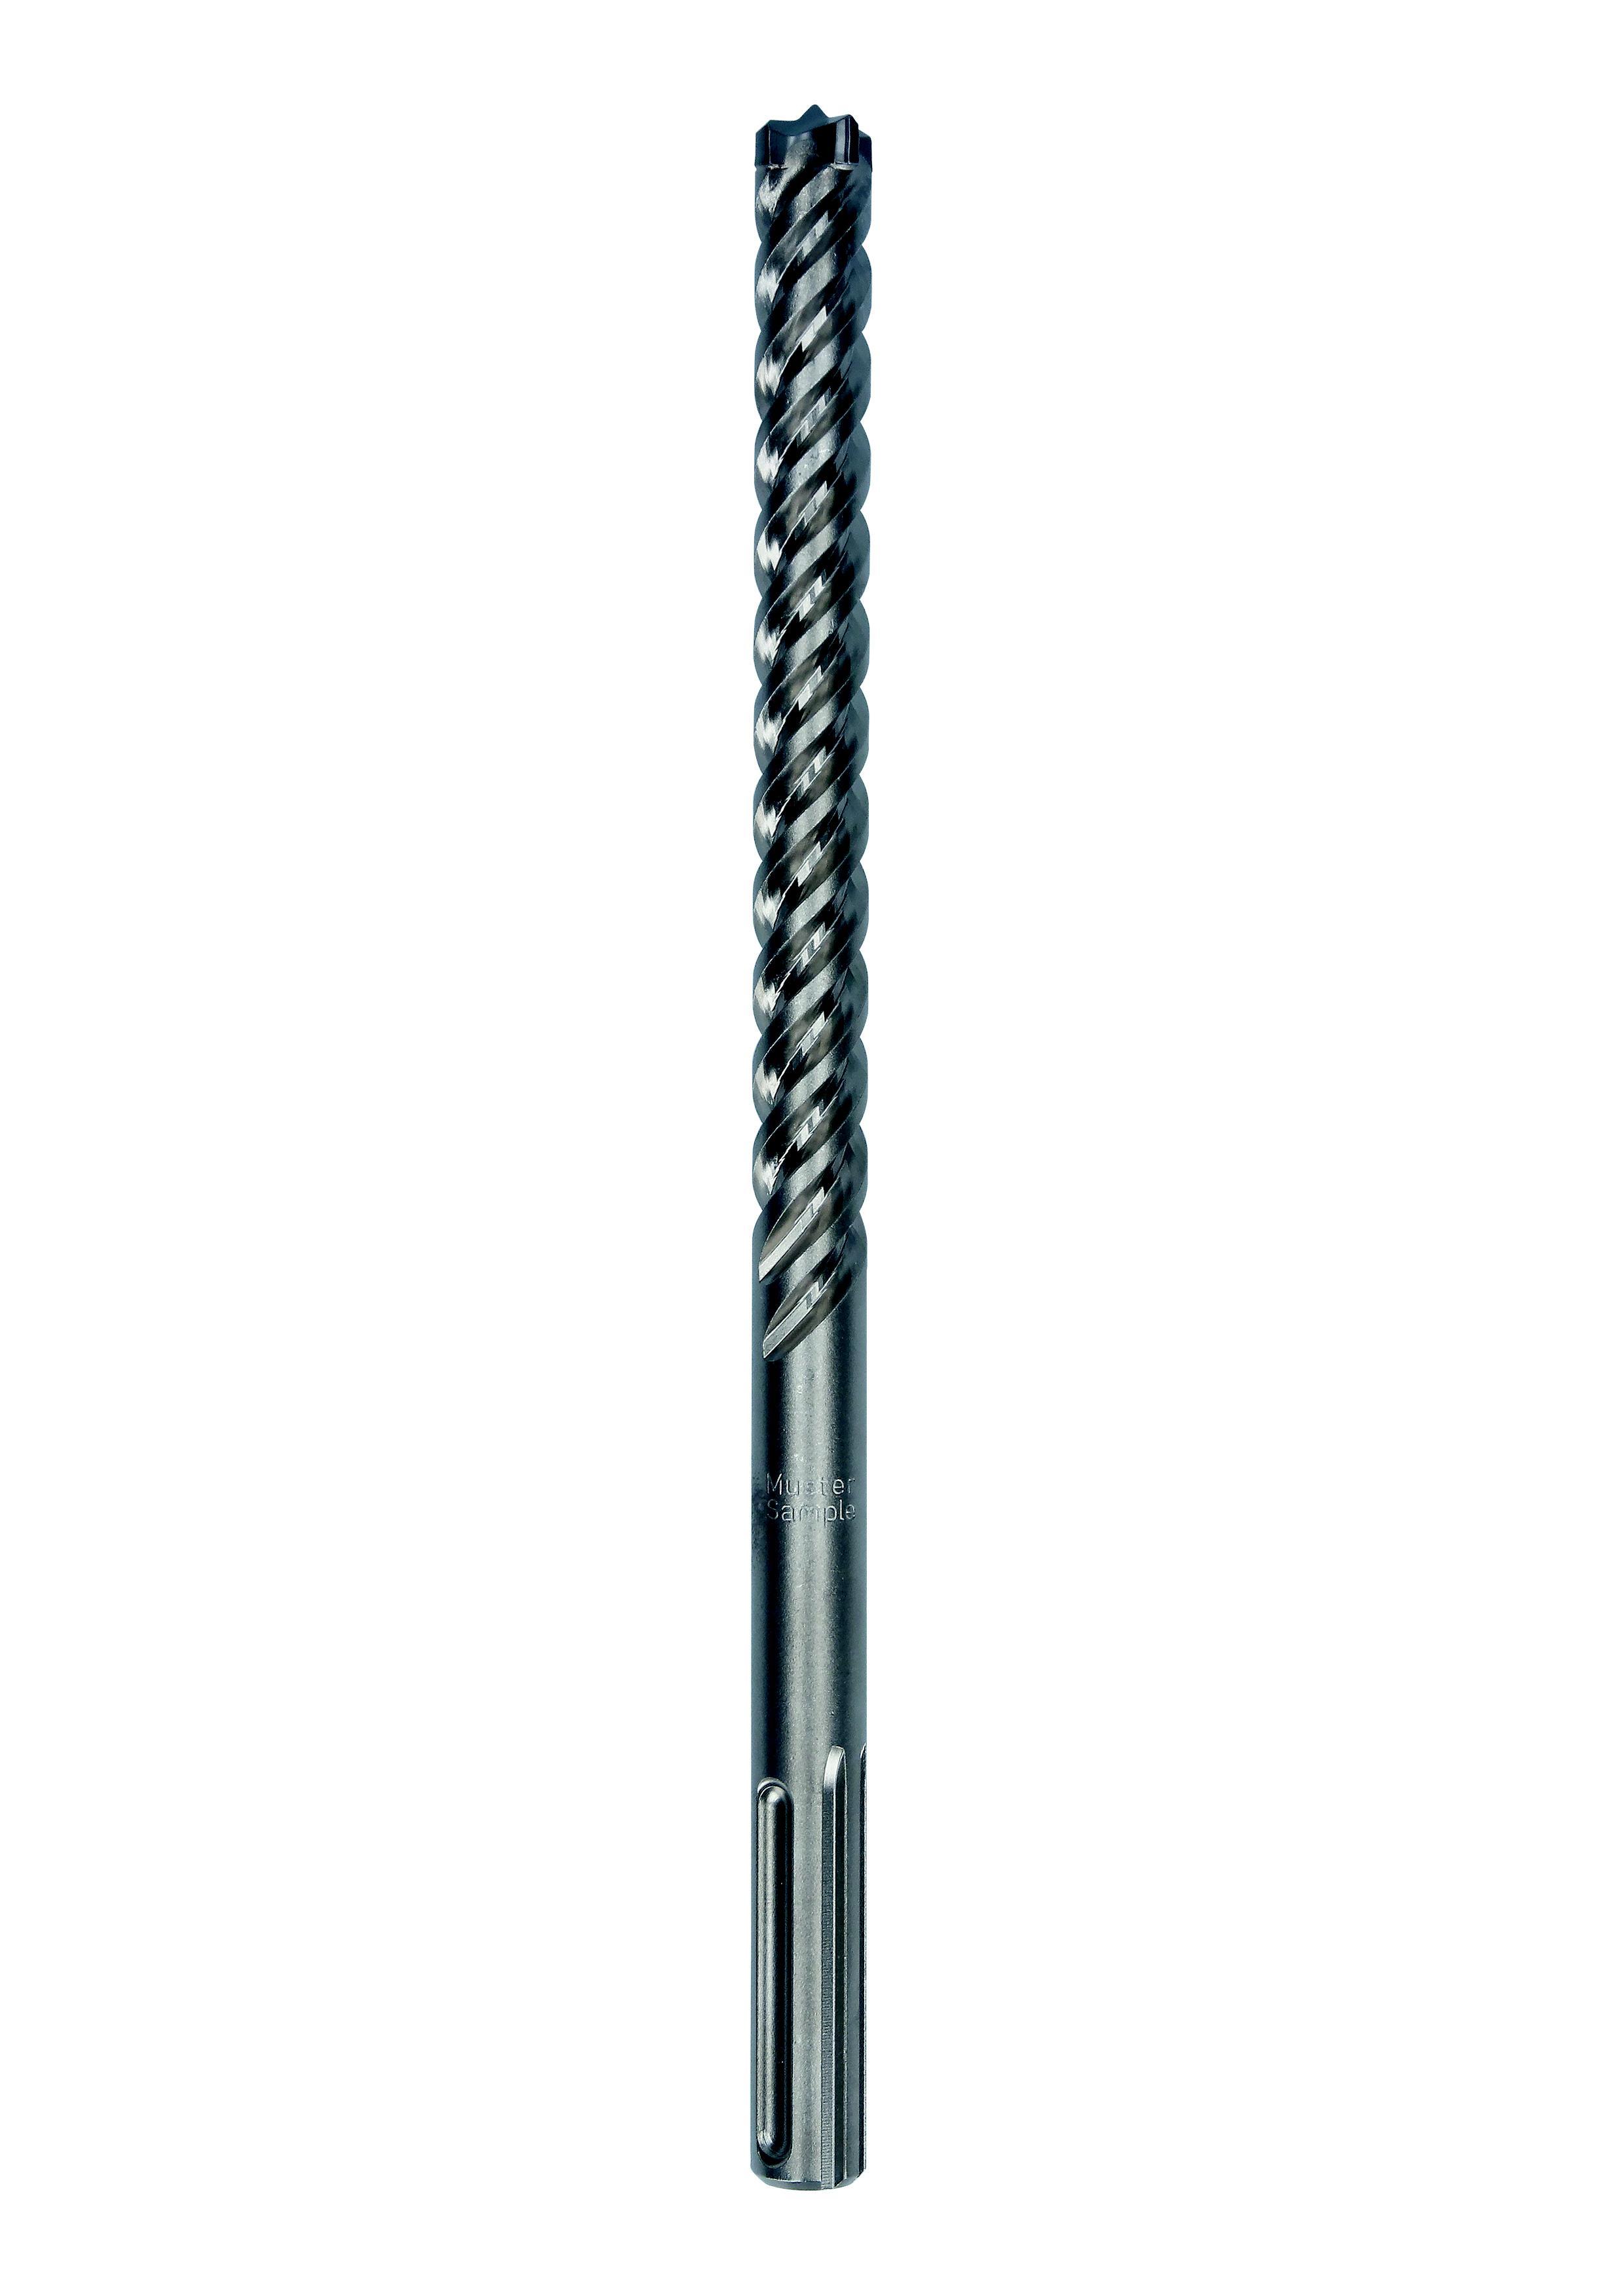 Бур Bosch Sds-max-8x 22 x 800 x 920 мм бур 22х800 920 мм sds max keil профи